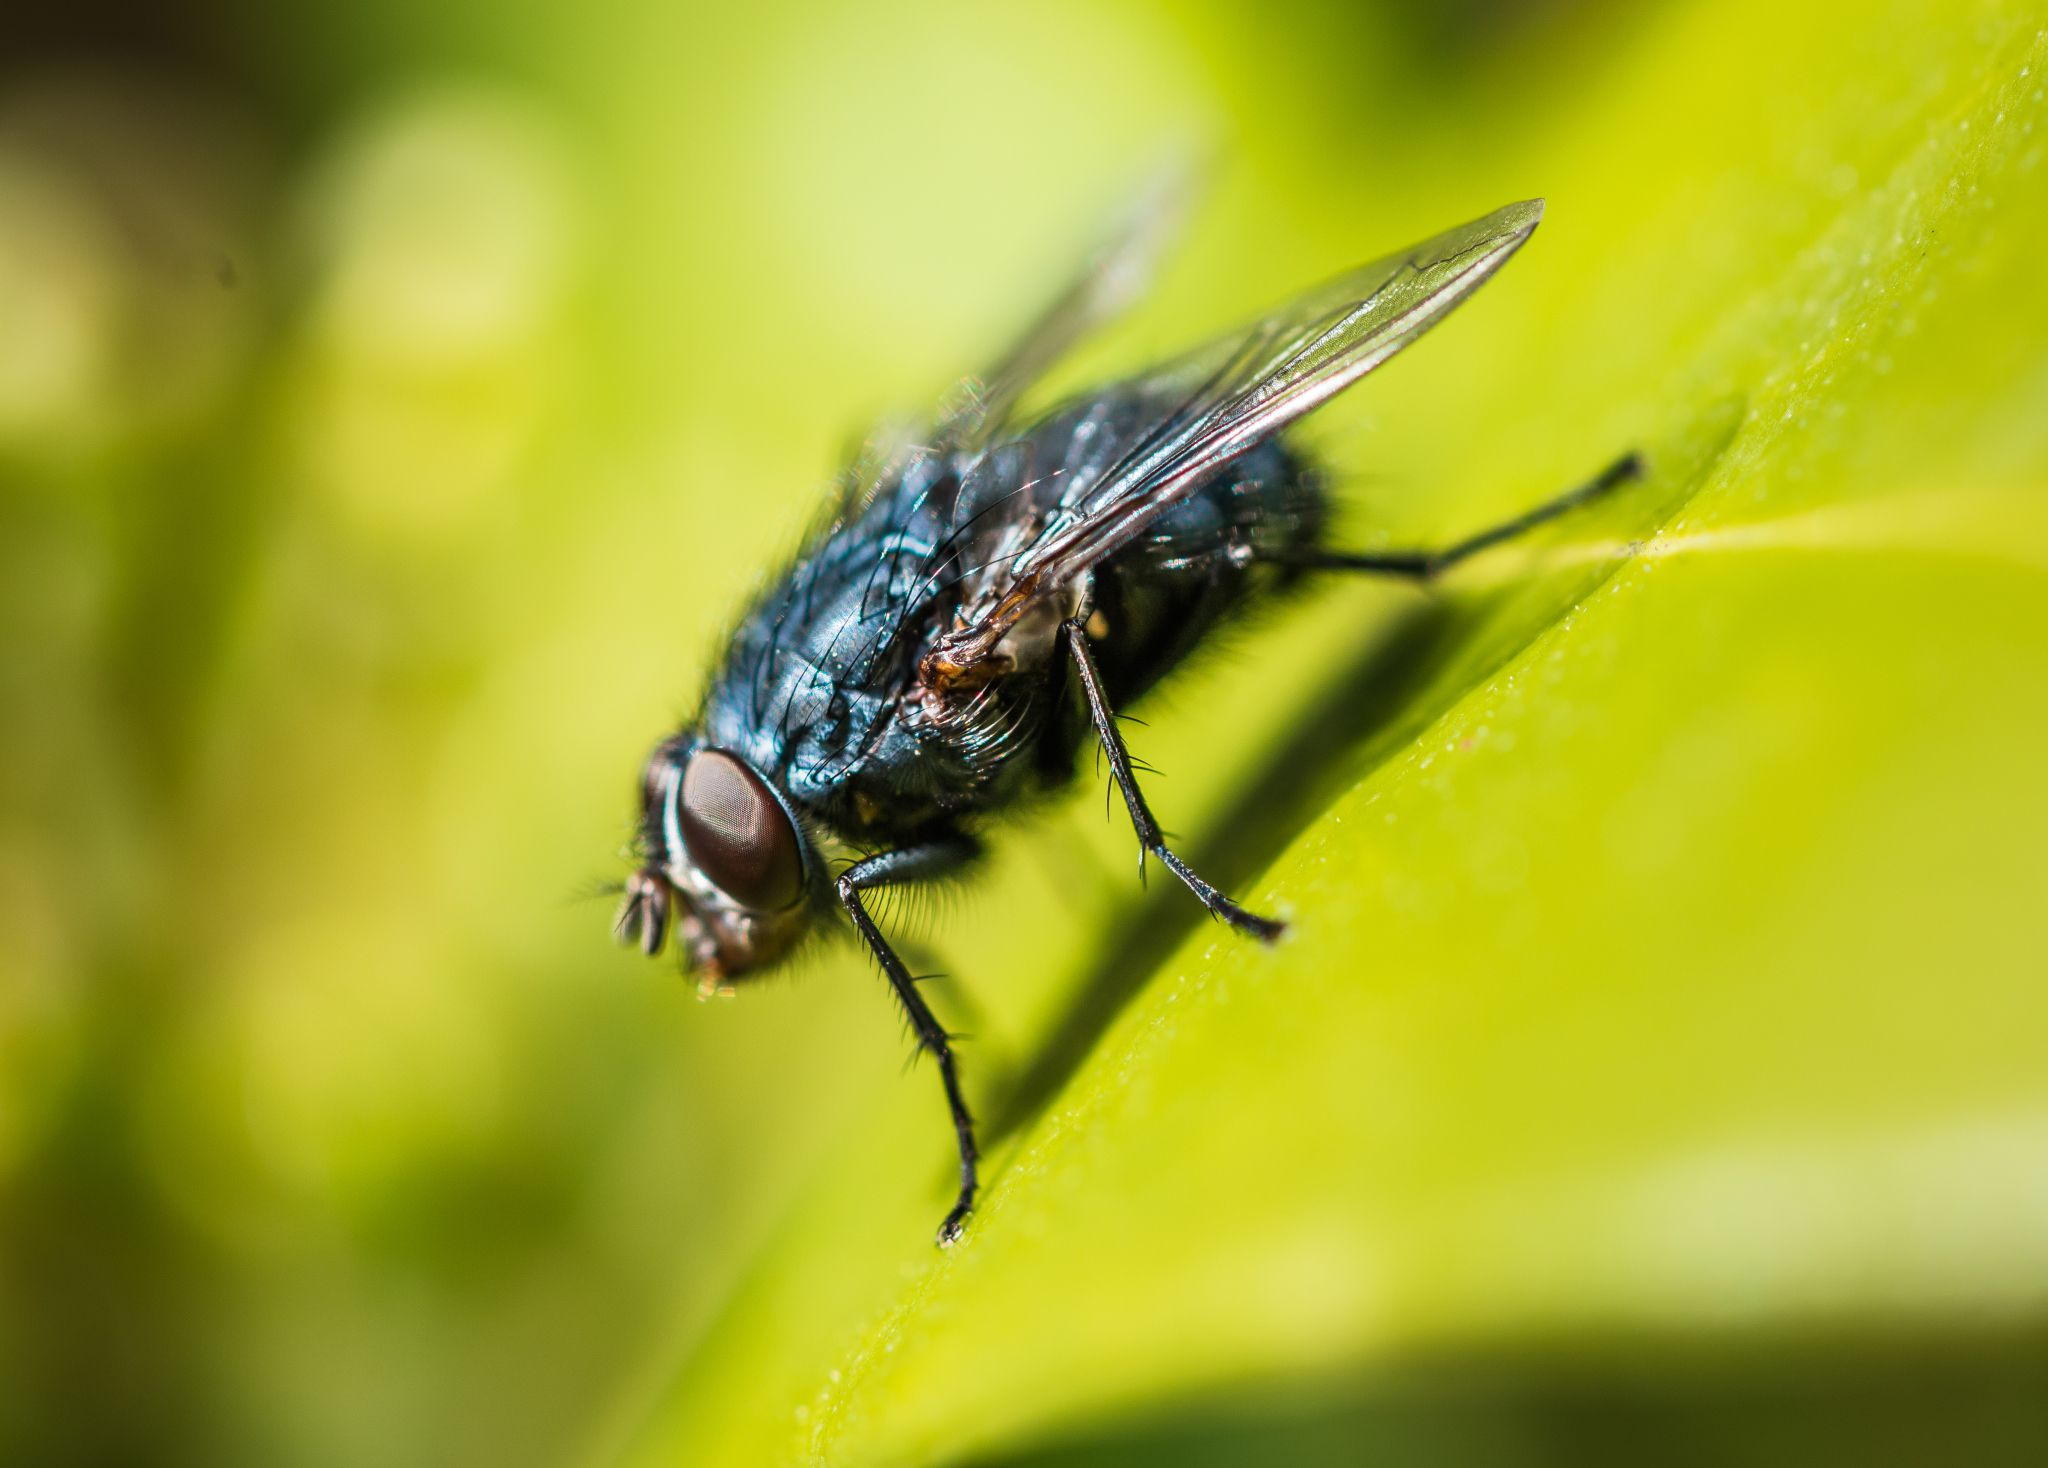 The Characteristics of Diptera